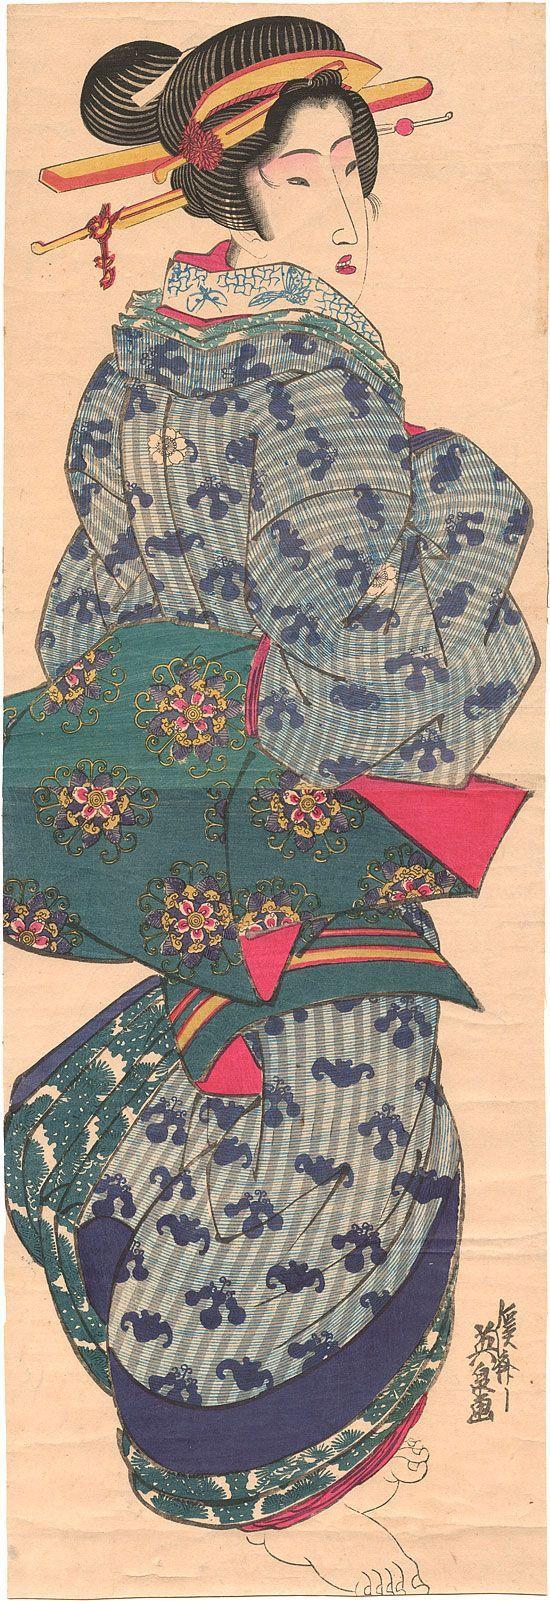 Eisen : Standing beauty wearing a bat/gourd patterned kimono 2h